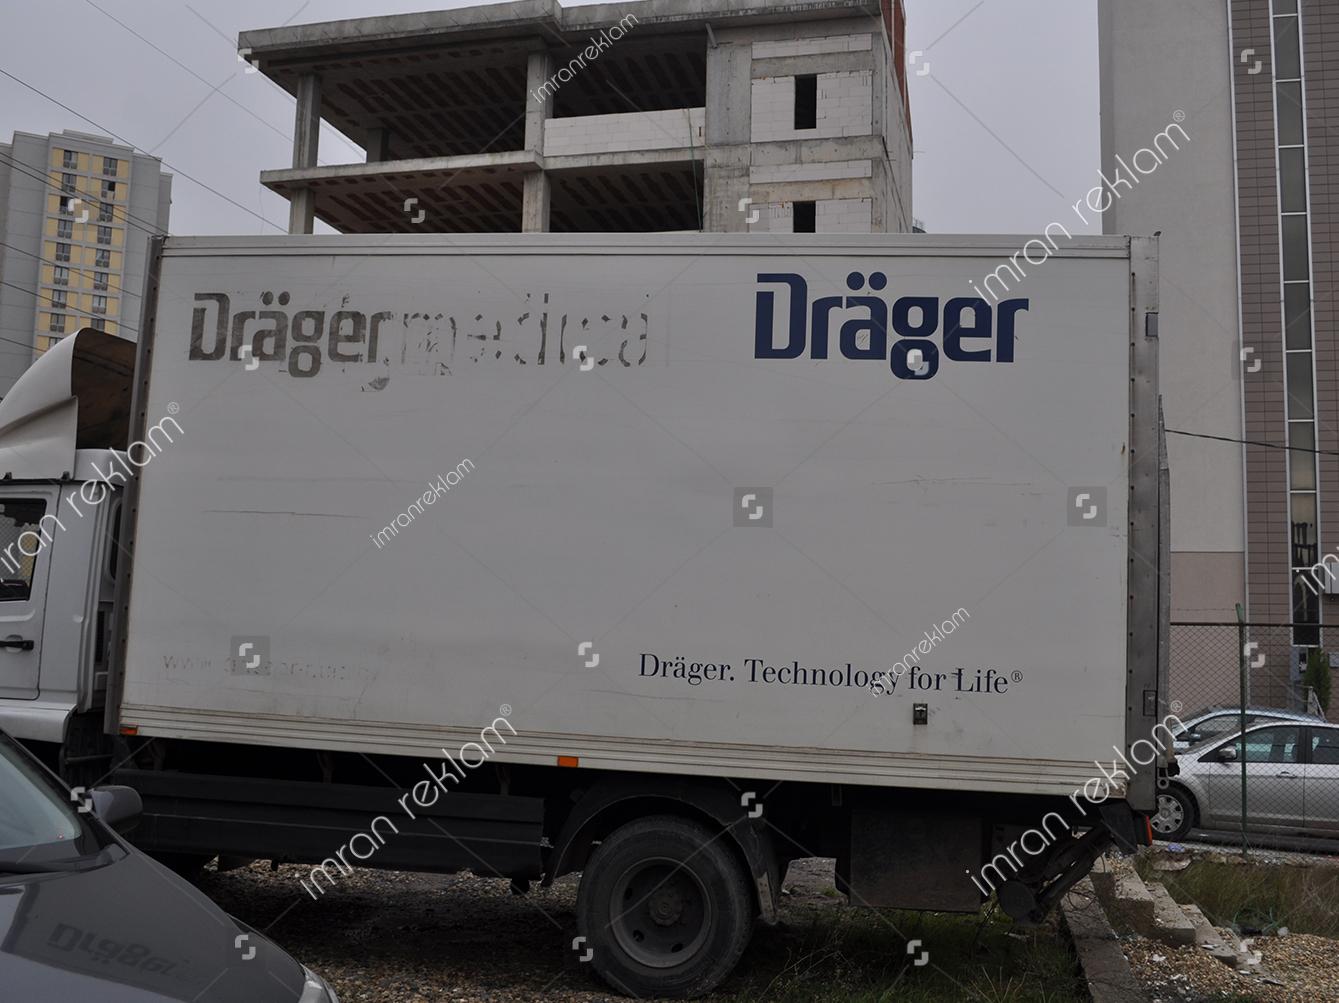 kamyonet-logo-giydirme-kaplama